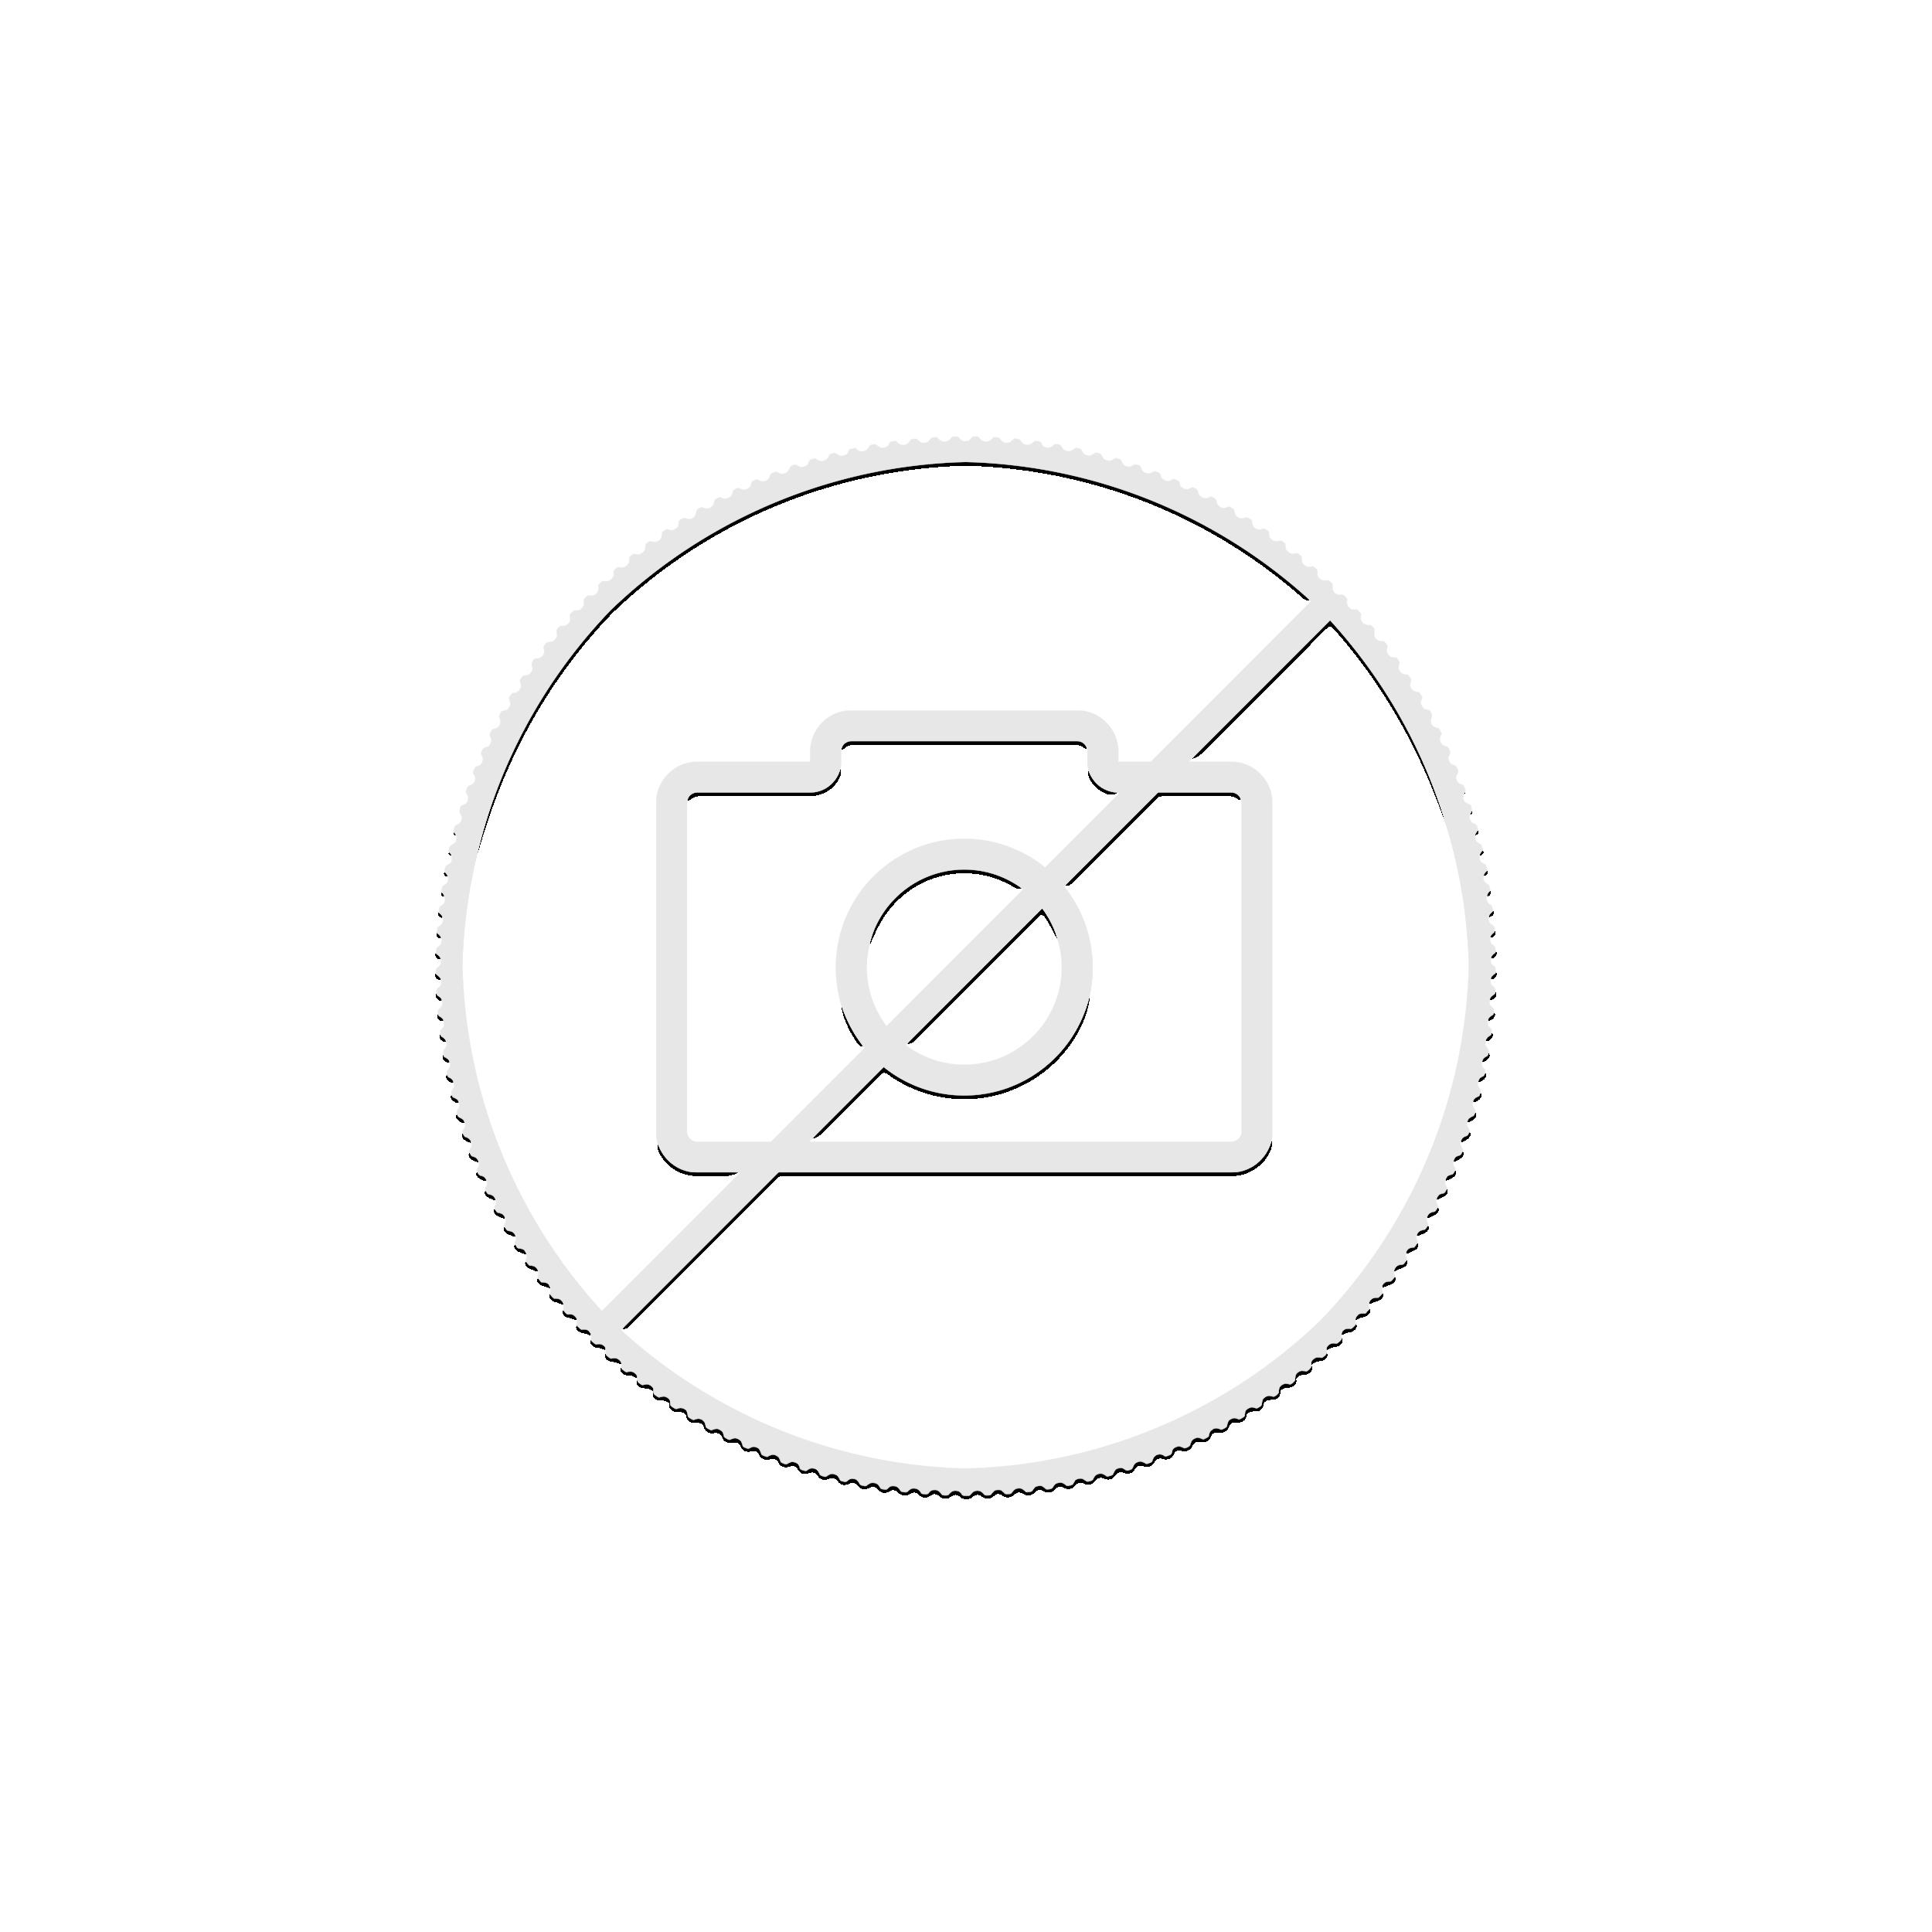 30 Gram gouden Panda munt 2018